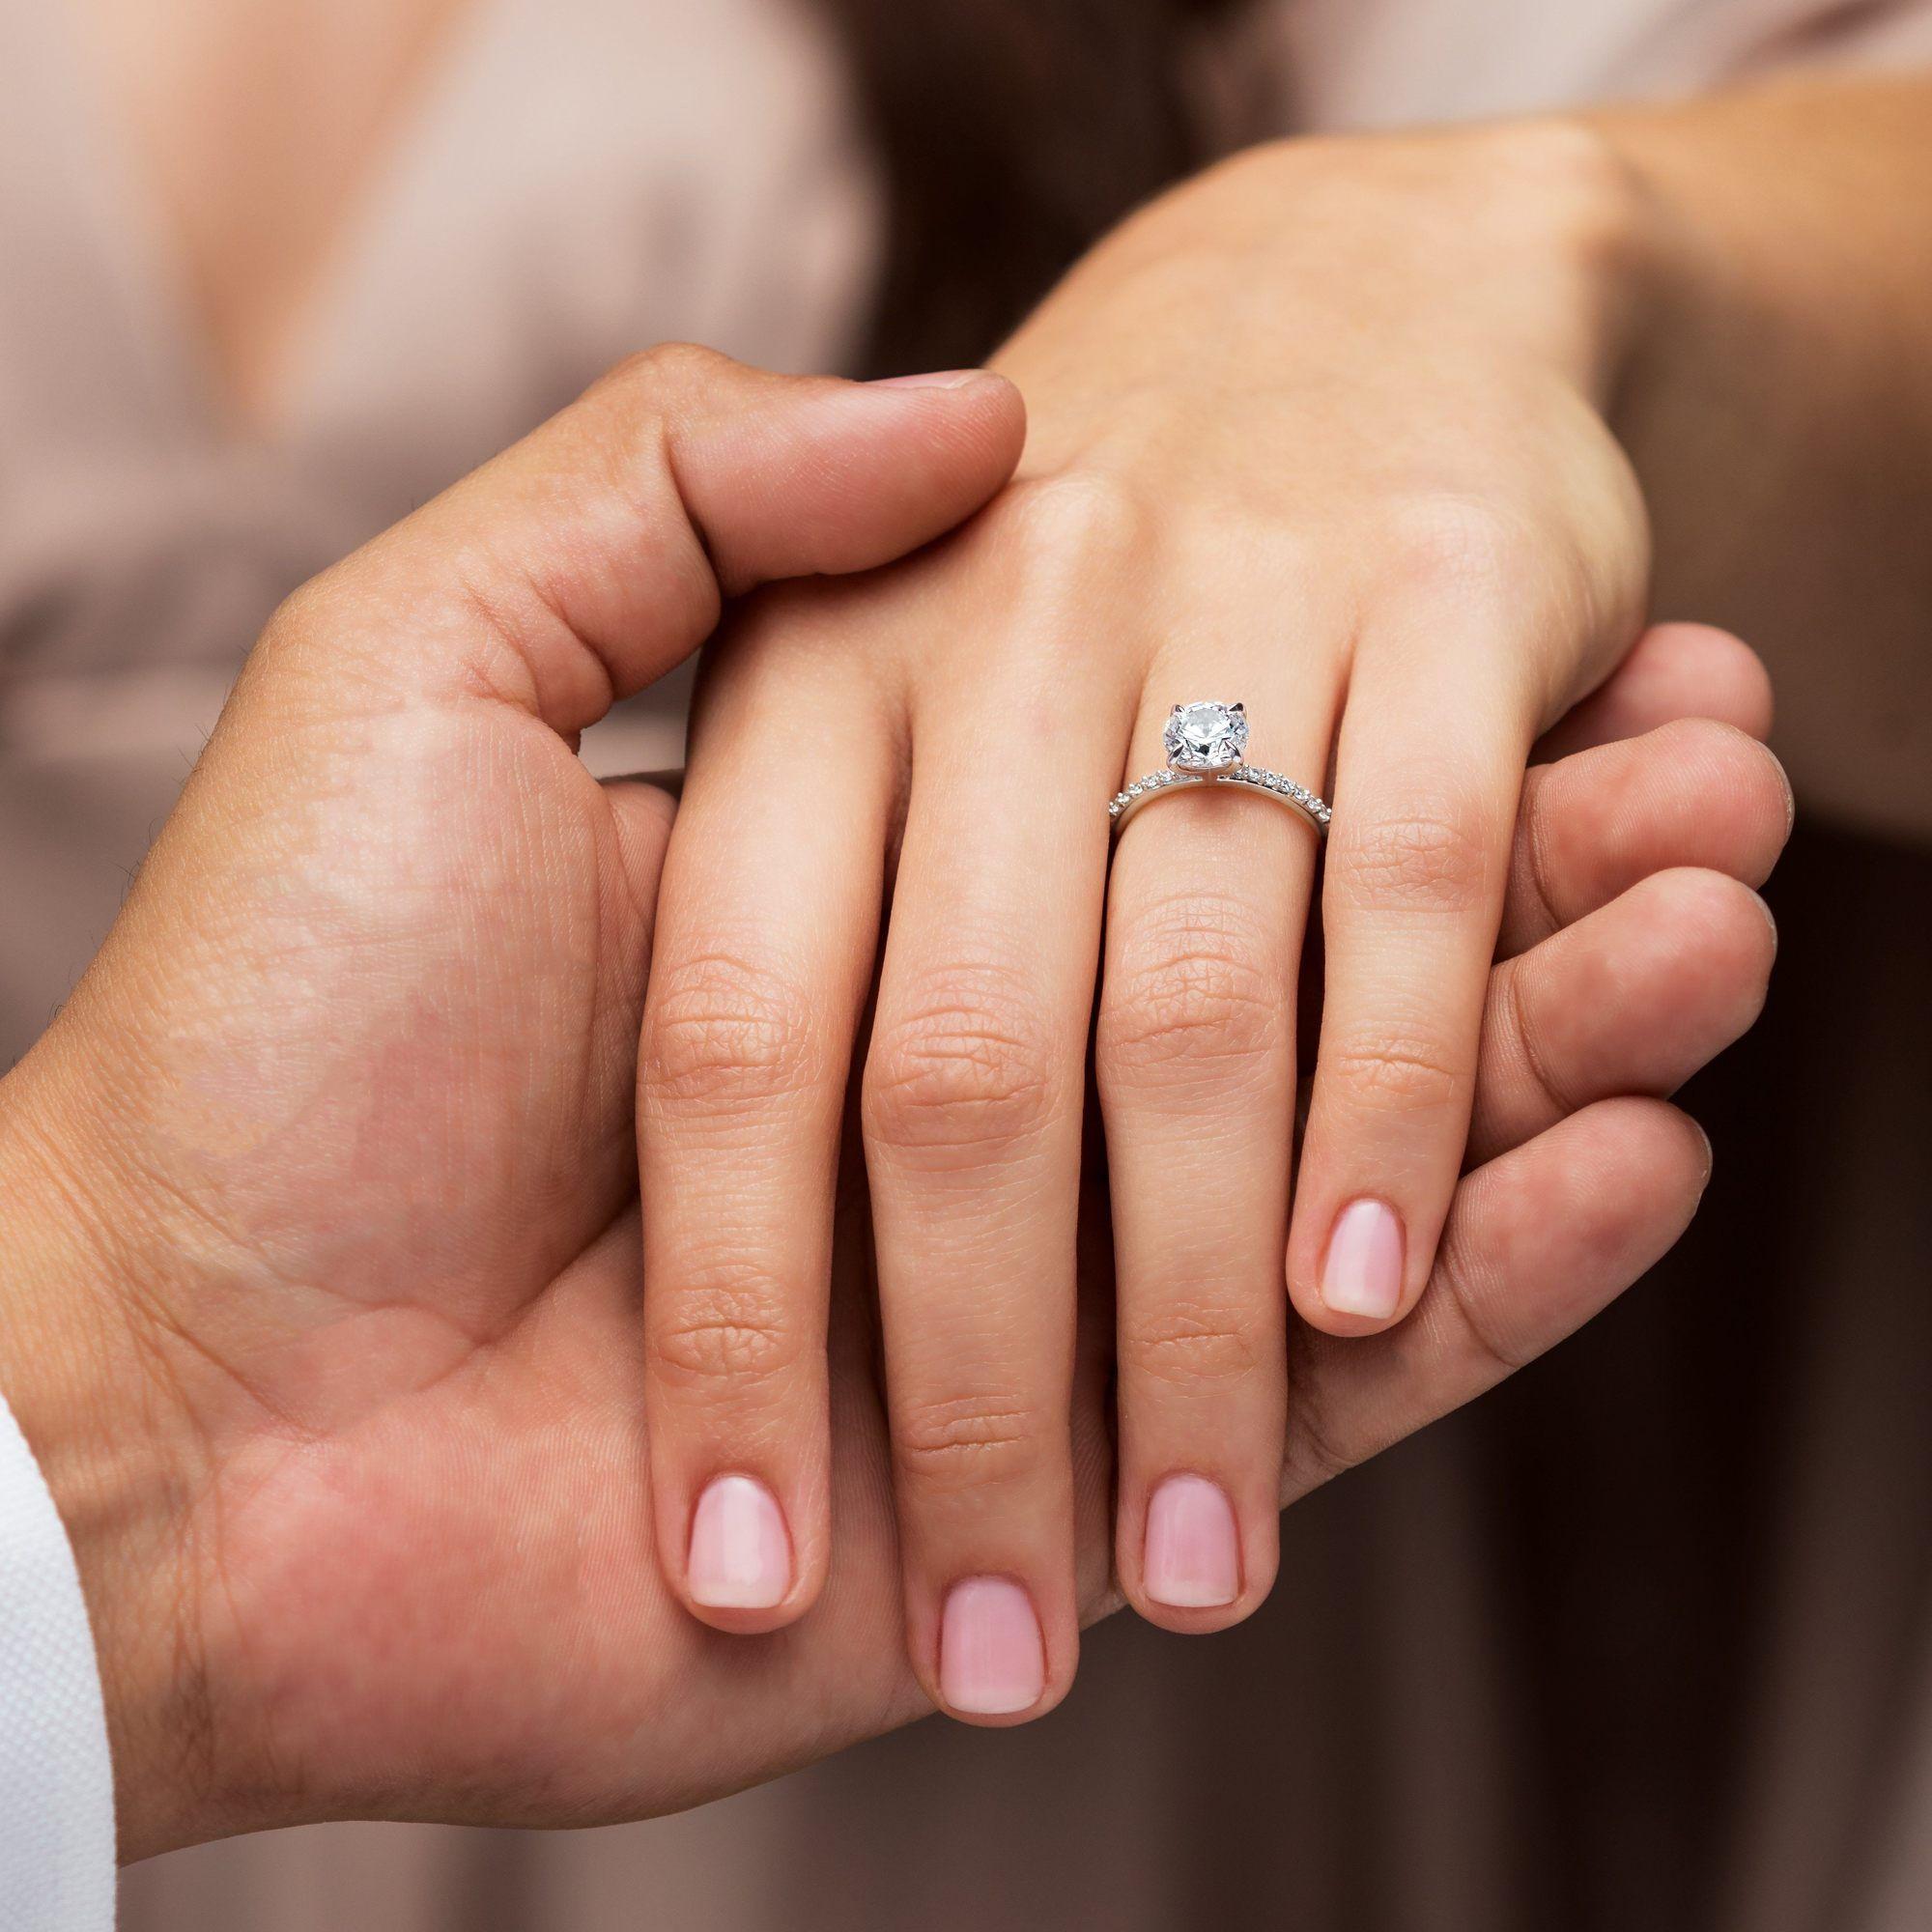 Alexandria Solitaire Lab Grown Diamond Engagement Ring Engagement Engagement Rings Expensive Wedding Rings